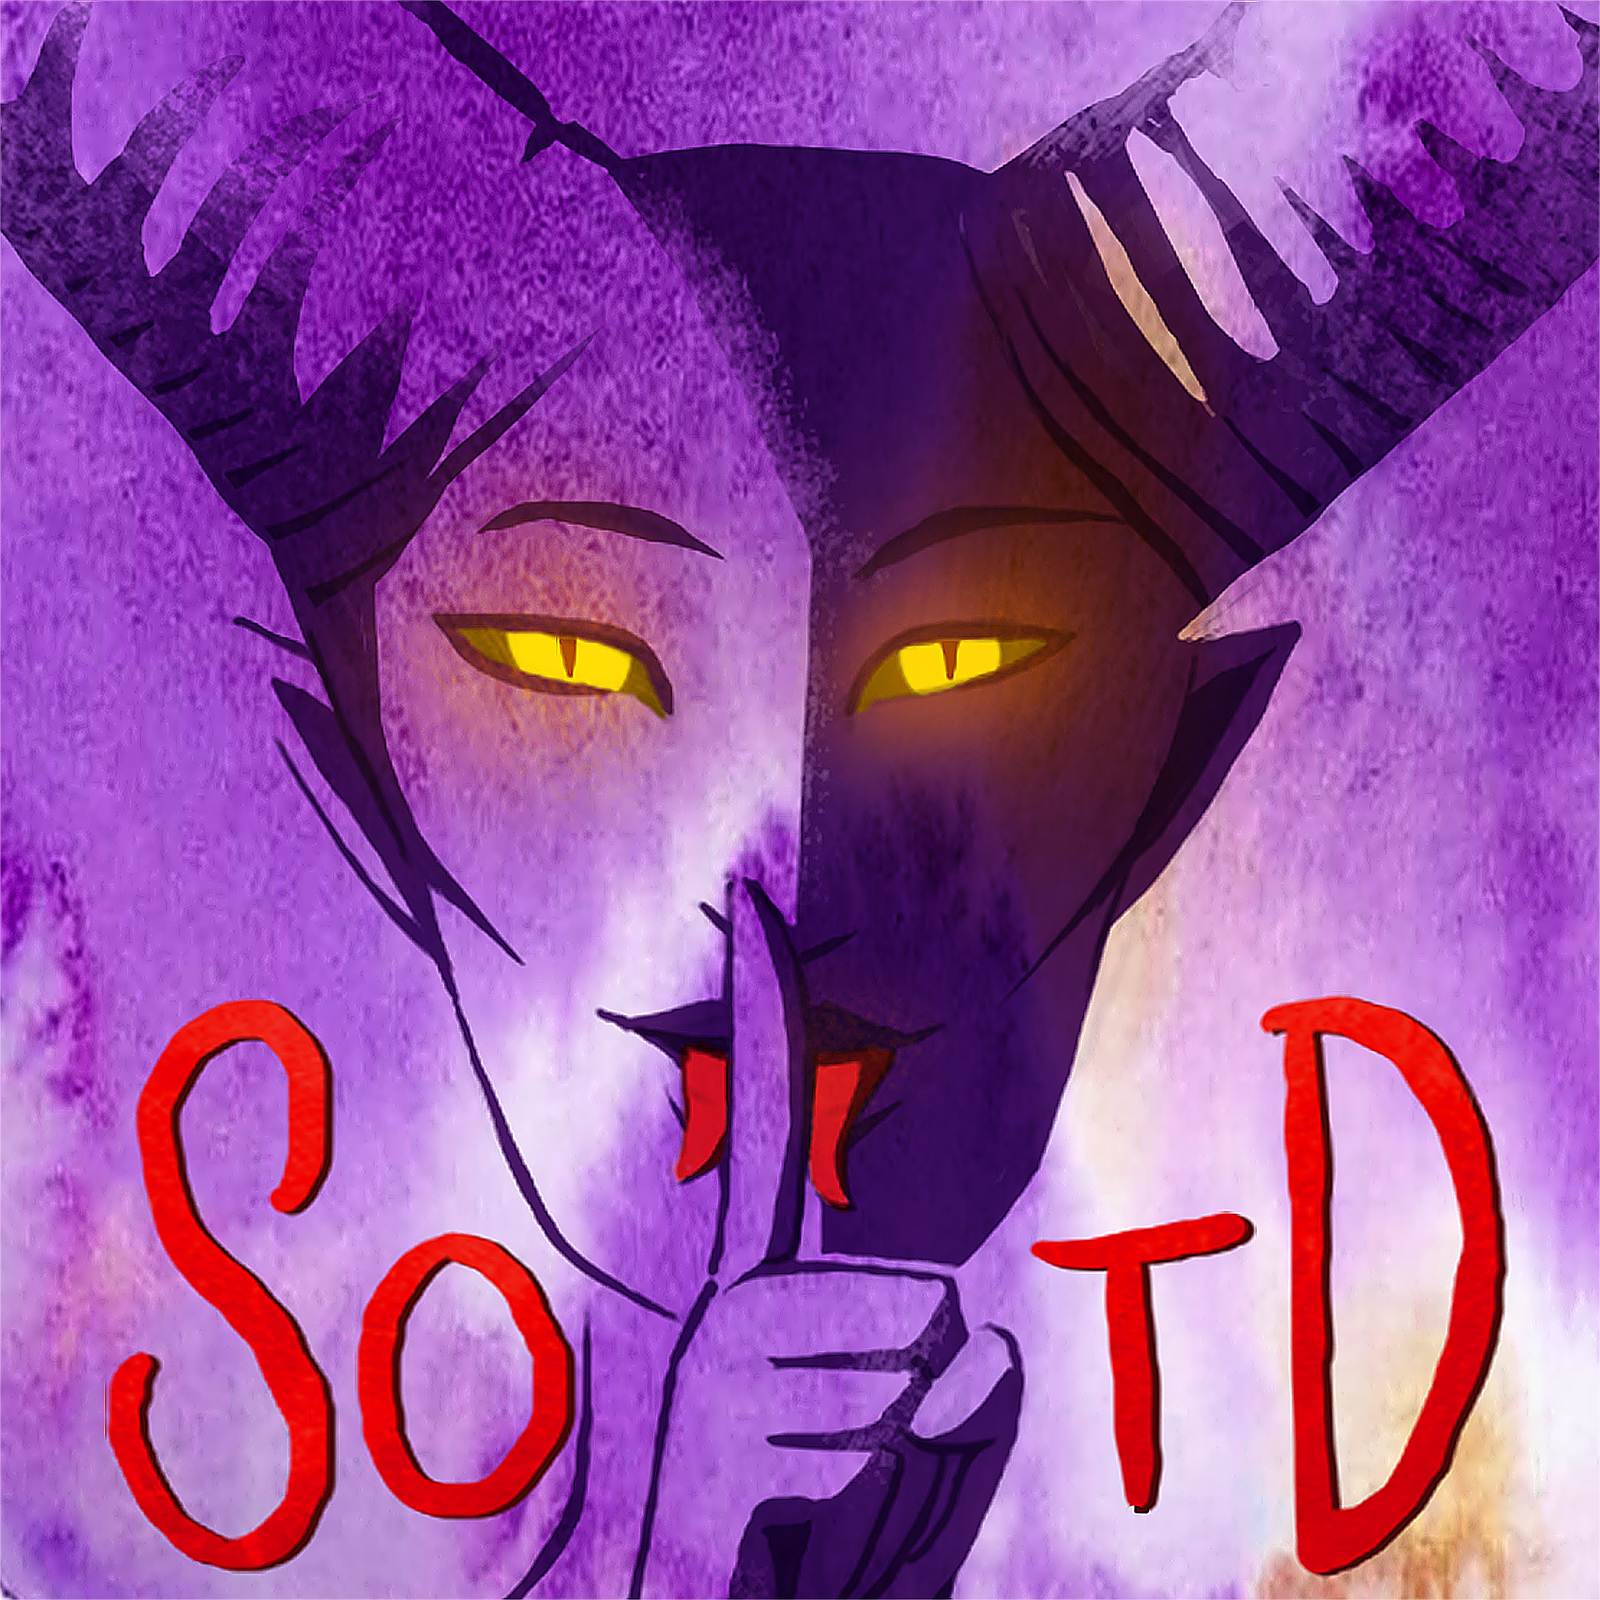 sotd-logo-apple.jpg